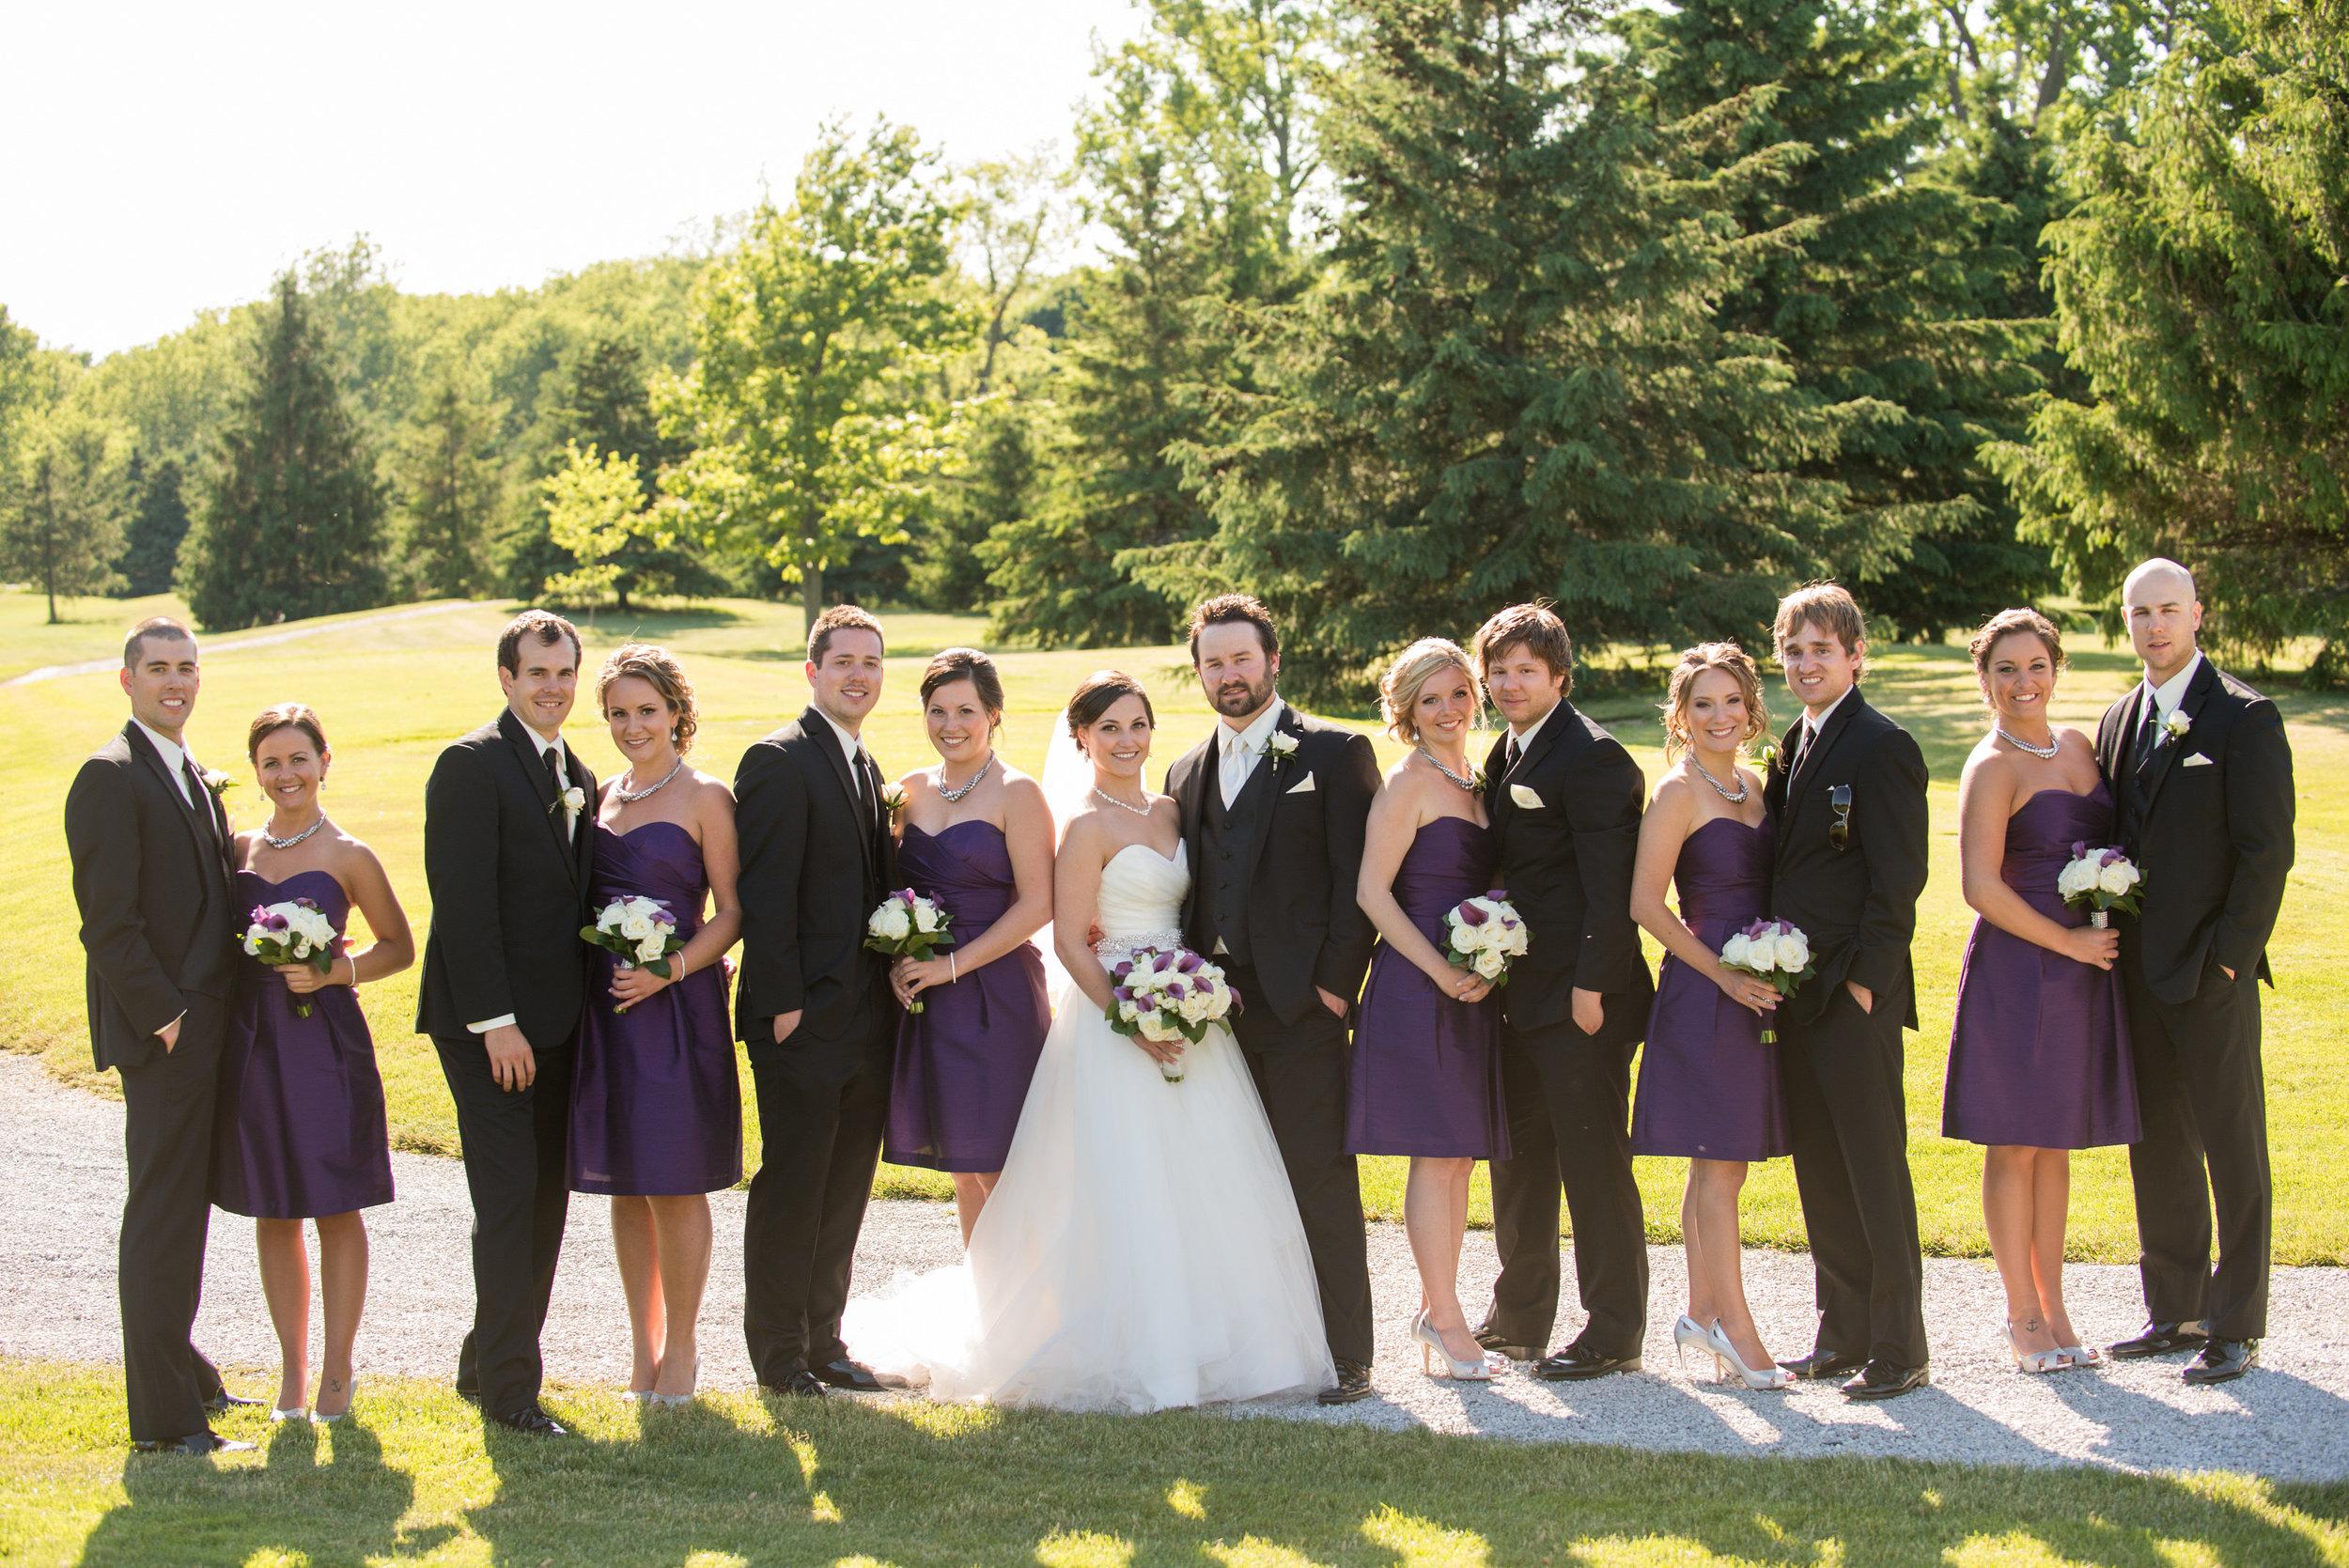 amanda-adam-wedding-0495.jpg